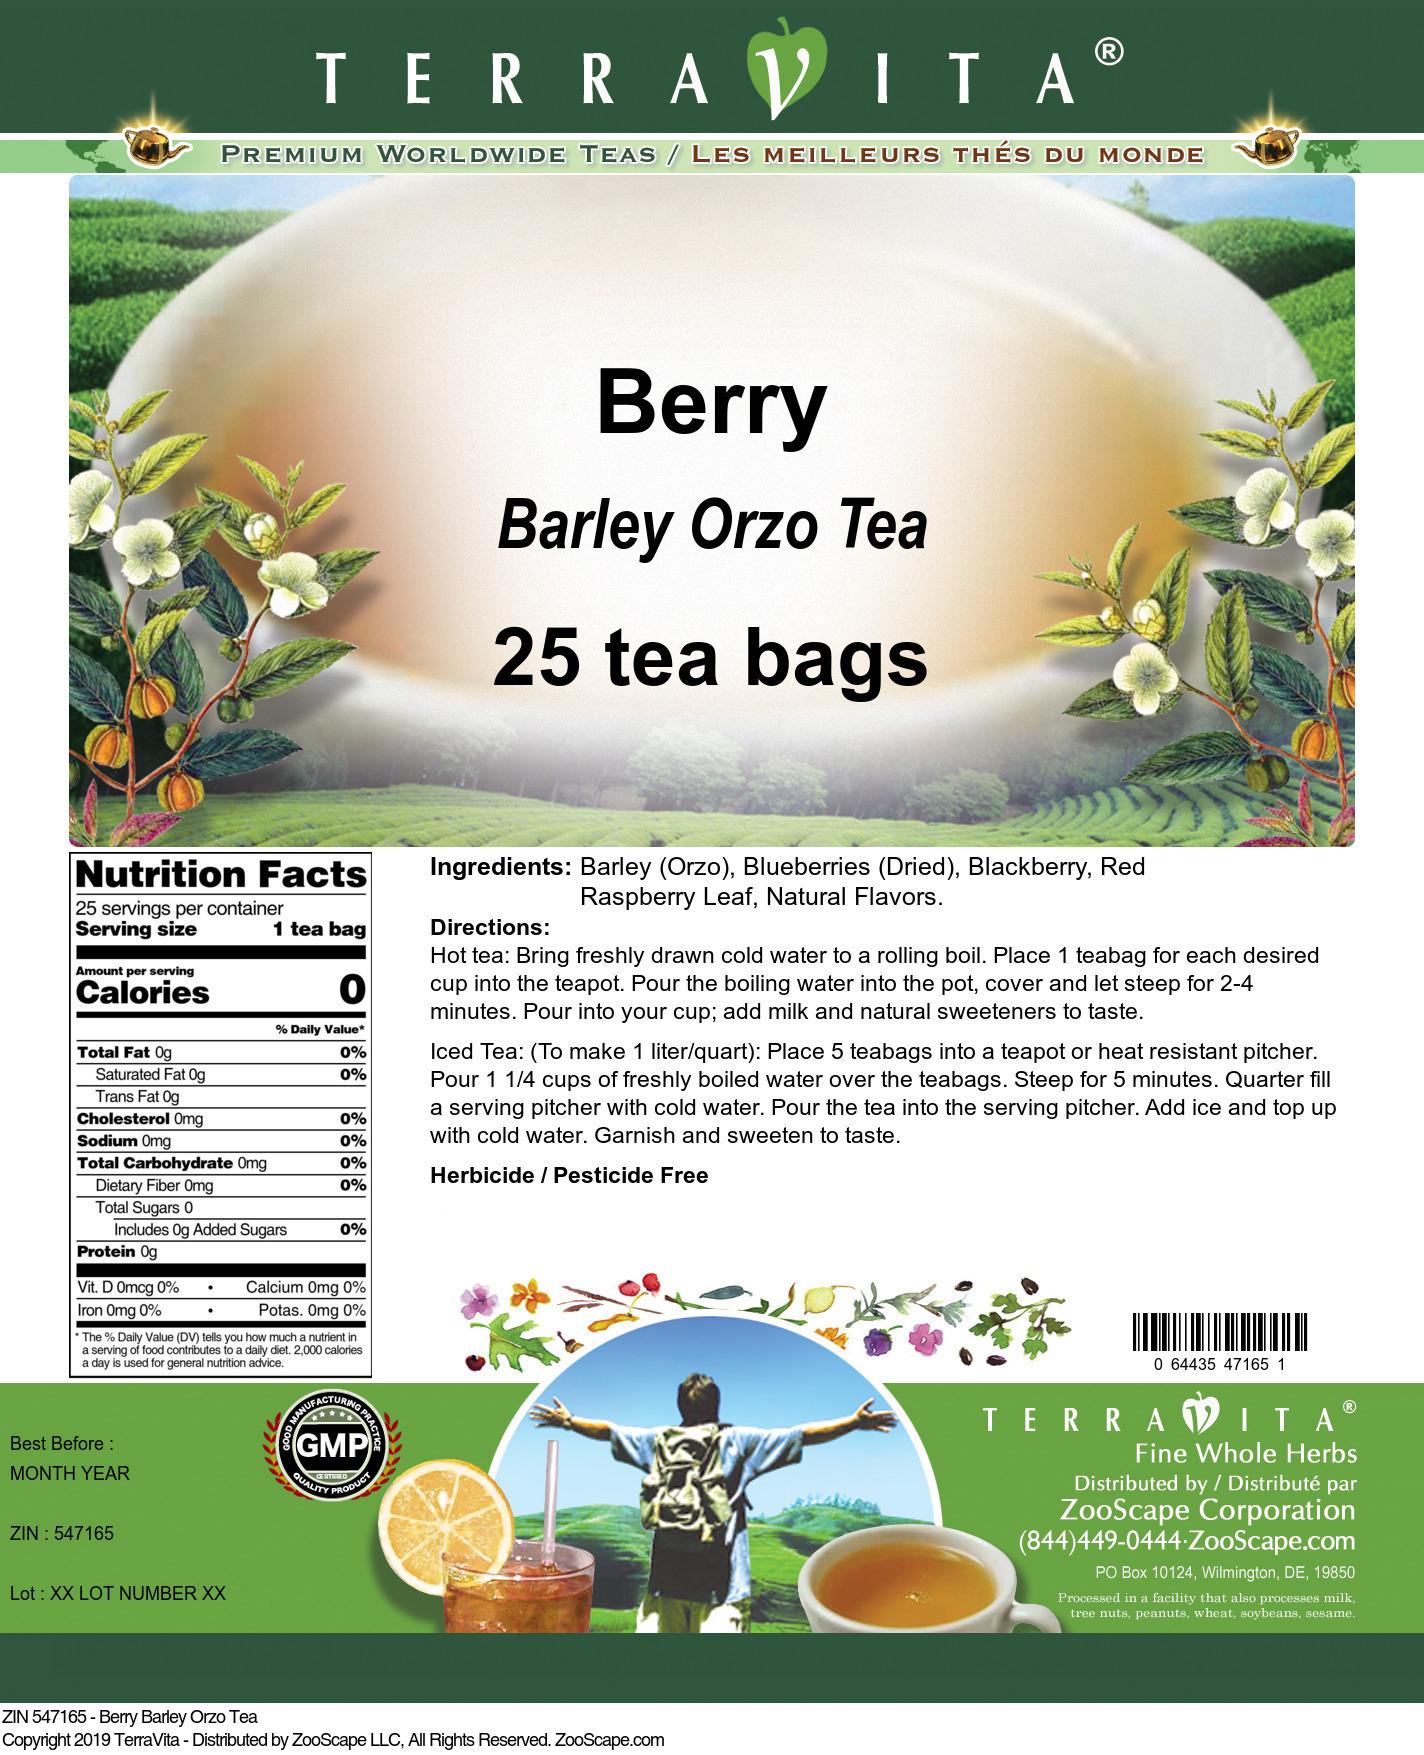 Berry Barley Orzo